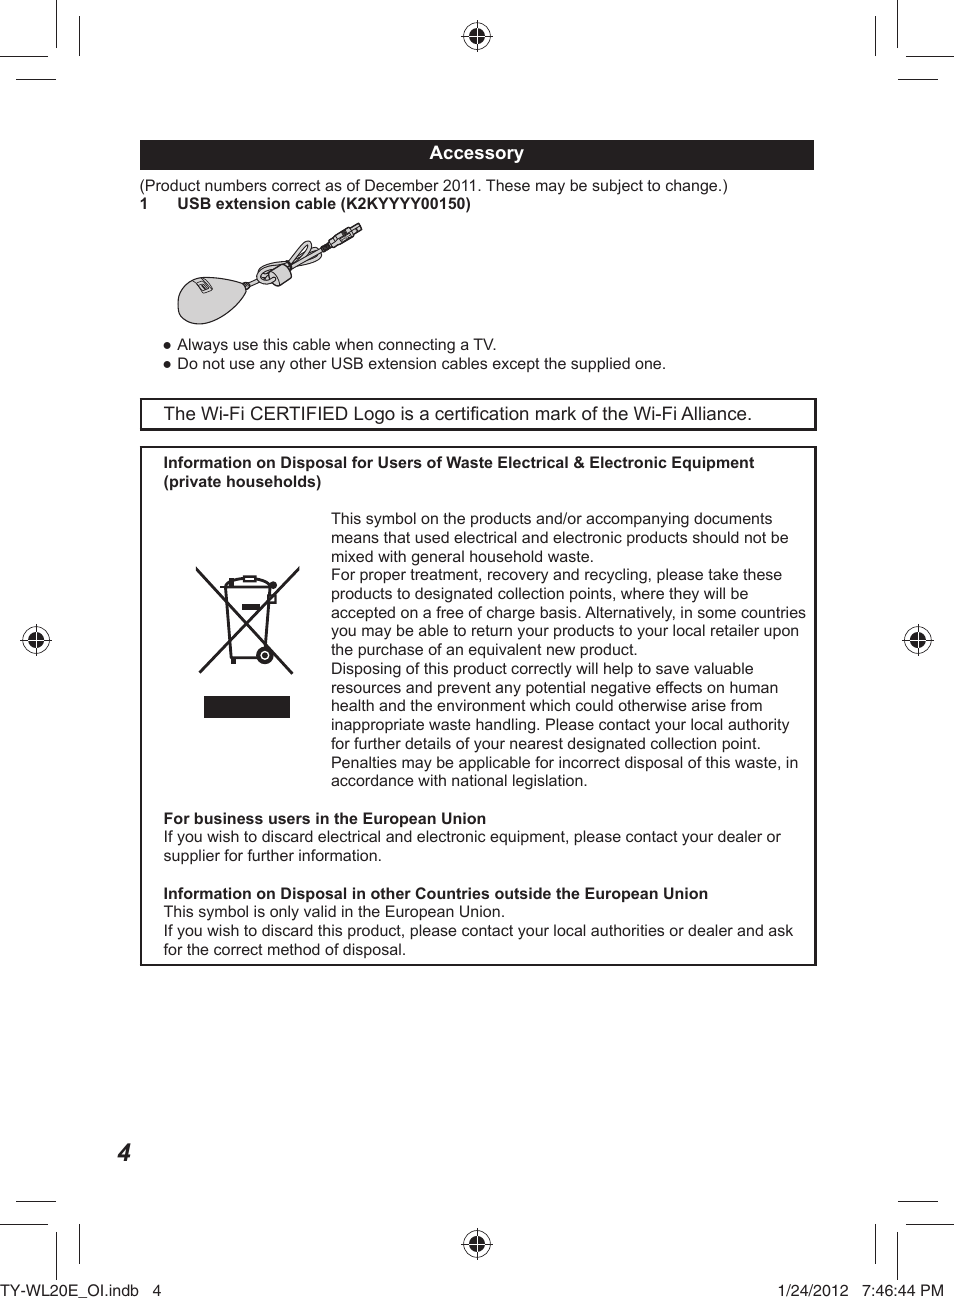 Panasonic Tywl20e User Manual Page 4 42